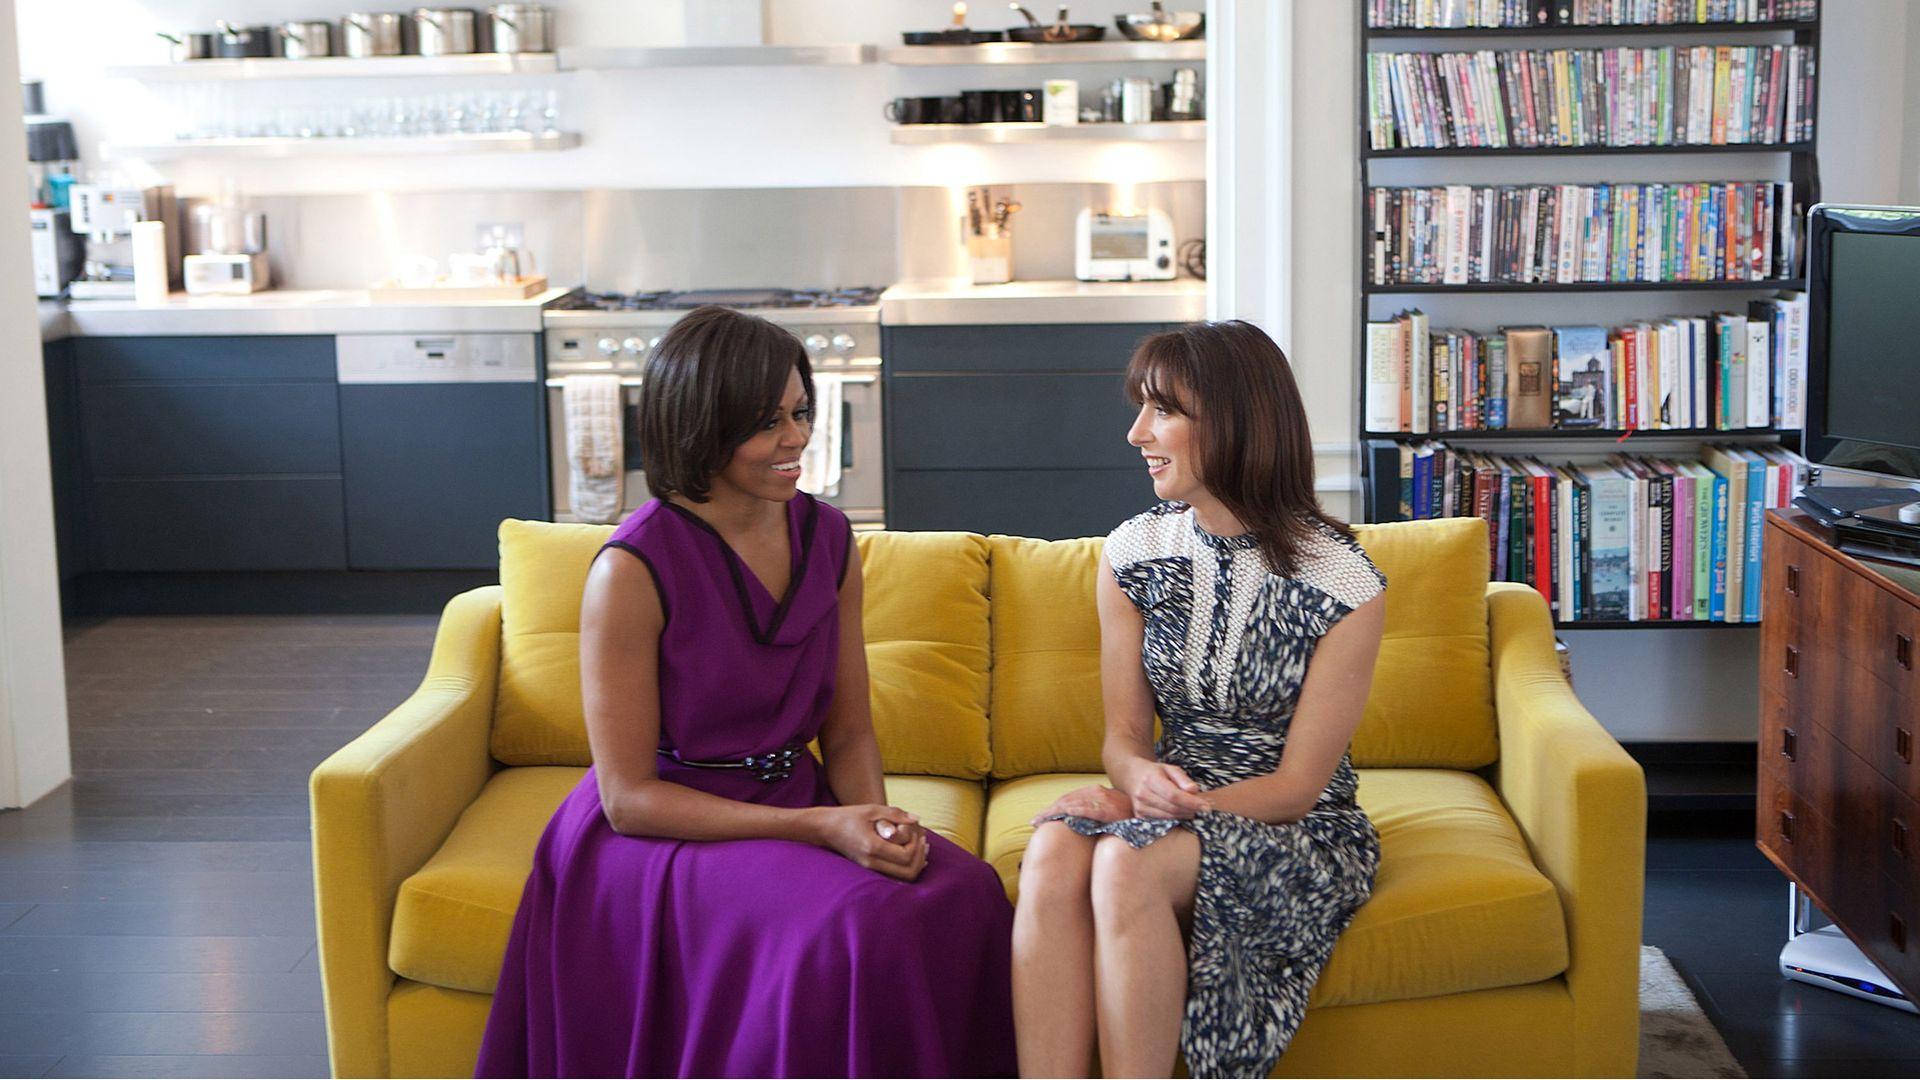 Michelle Obama and Samantha Cameron, partner of David Cameron, talk before having tea at Downing Street - Credit: Getty Images